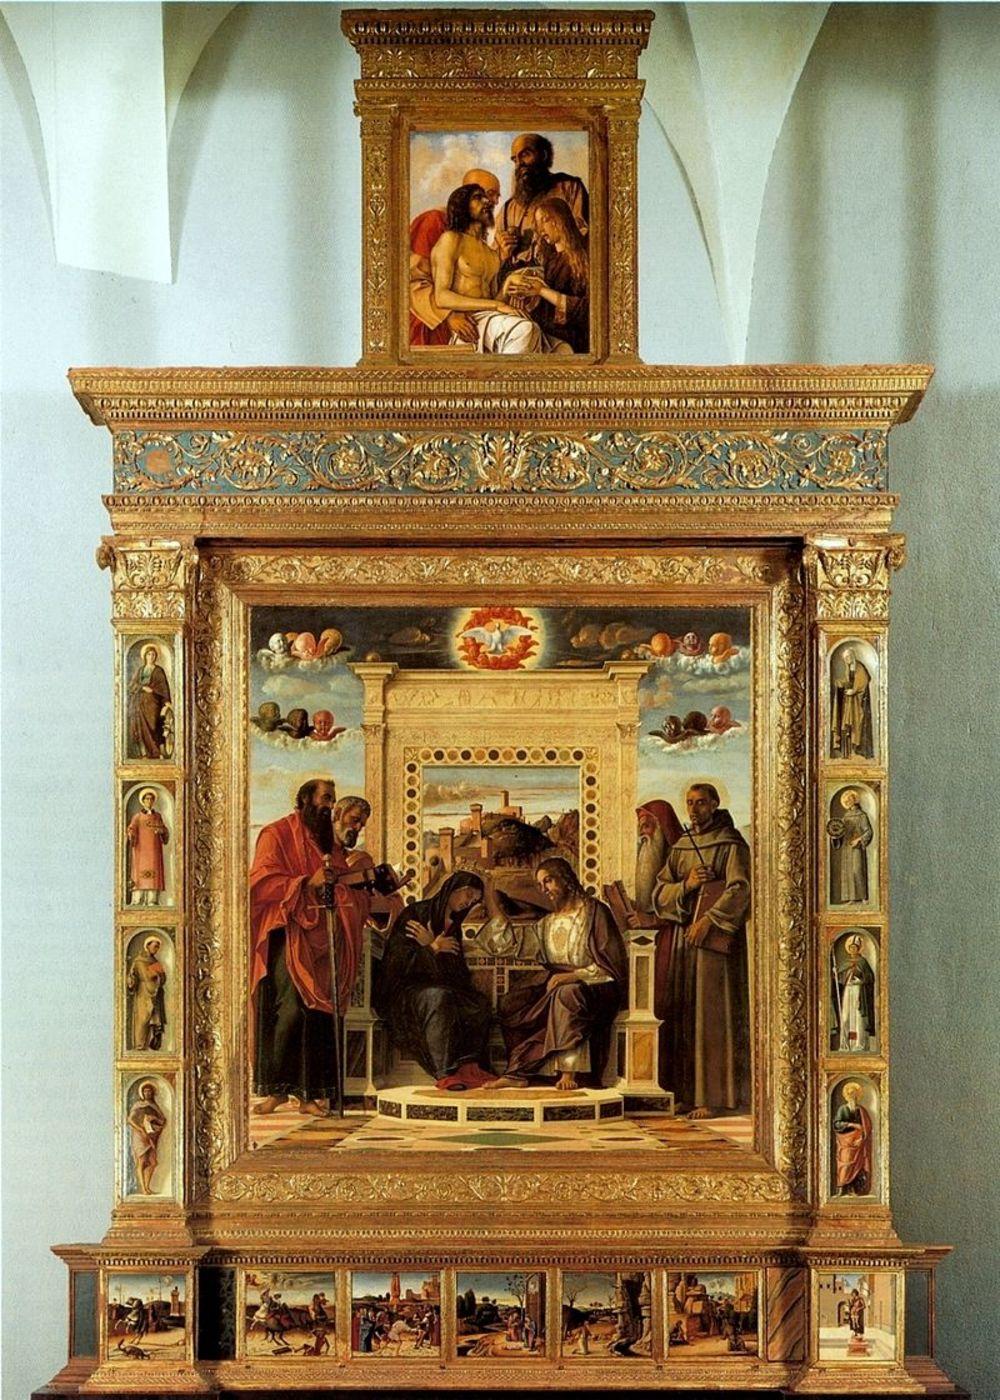 Беллини. Алтарь Пезаро. 1470-80. Пезаро, Городские музеи.